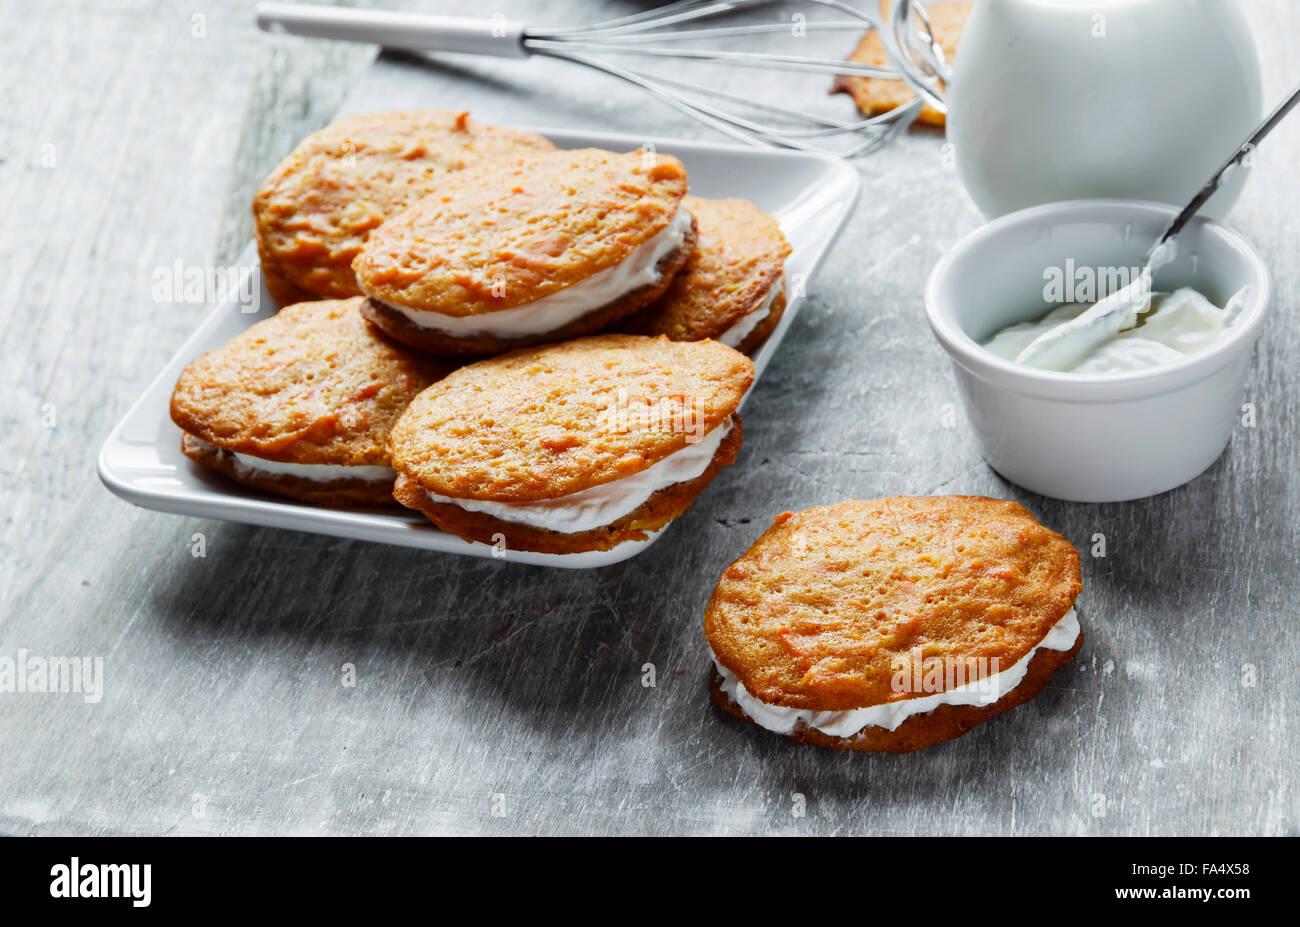 Creme gefüllt Karotte Kuchen Cookies sandwich Stockbild